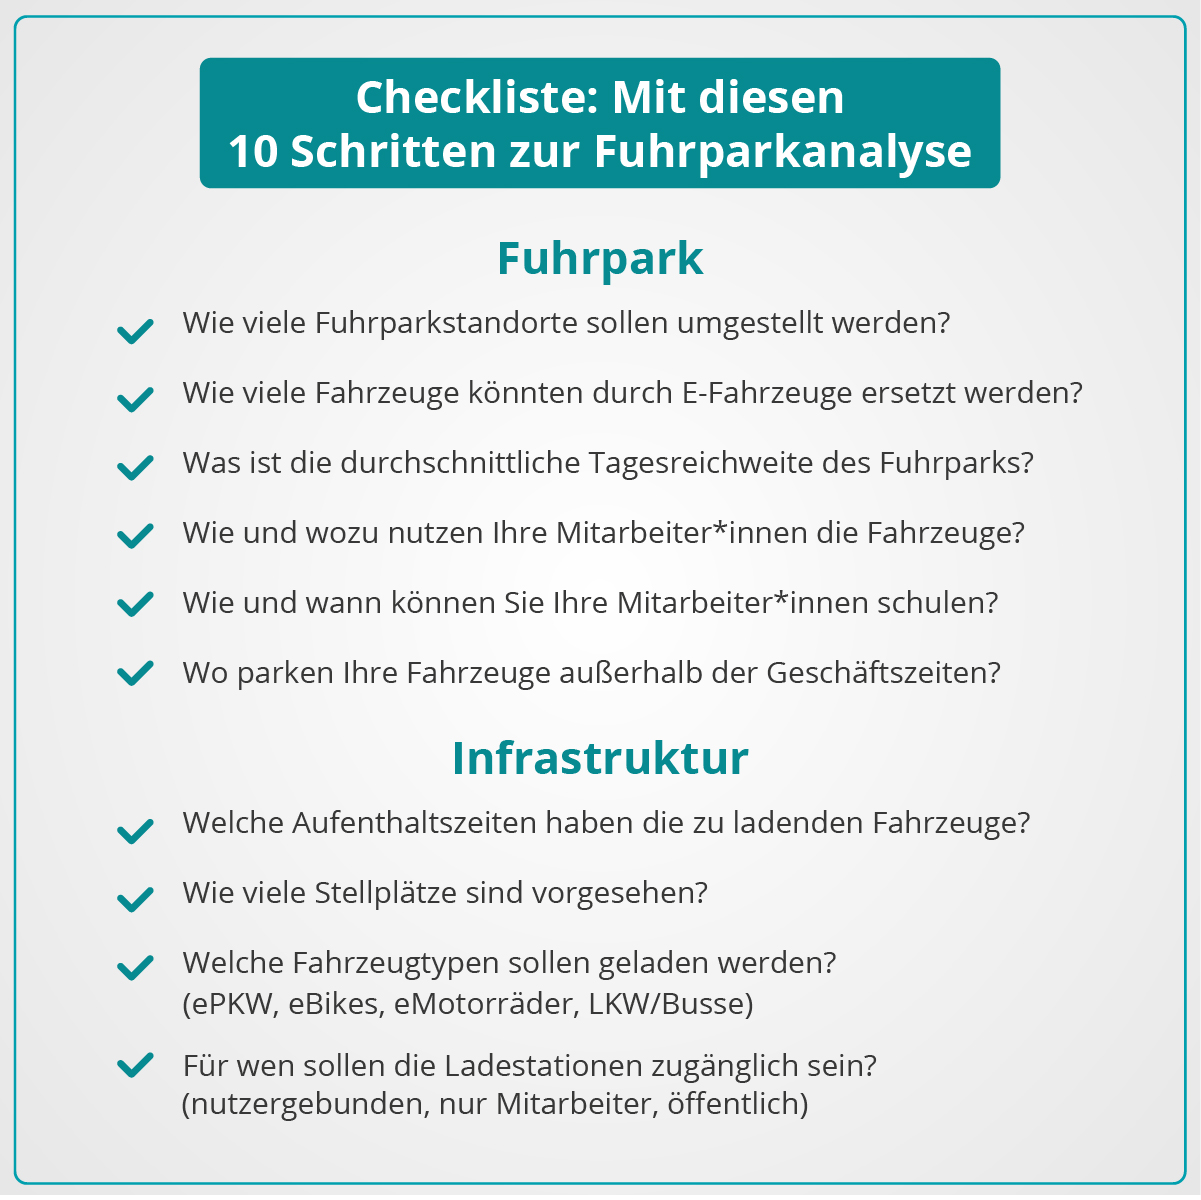 Checkliste Fuhrparkanalyse - umschalten.de